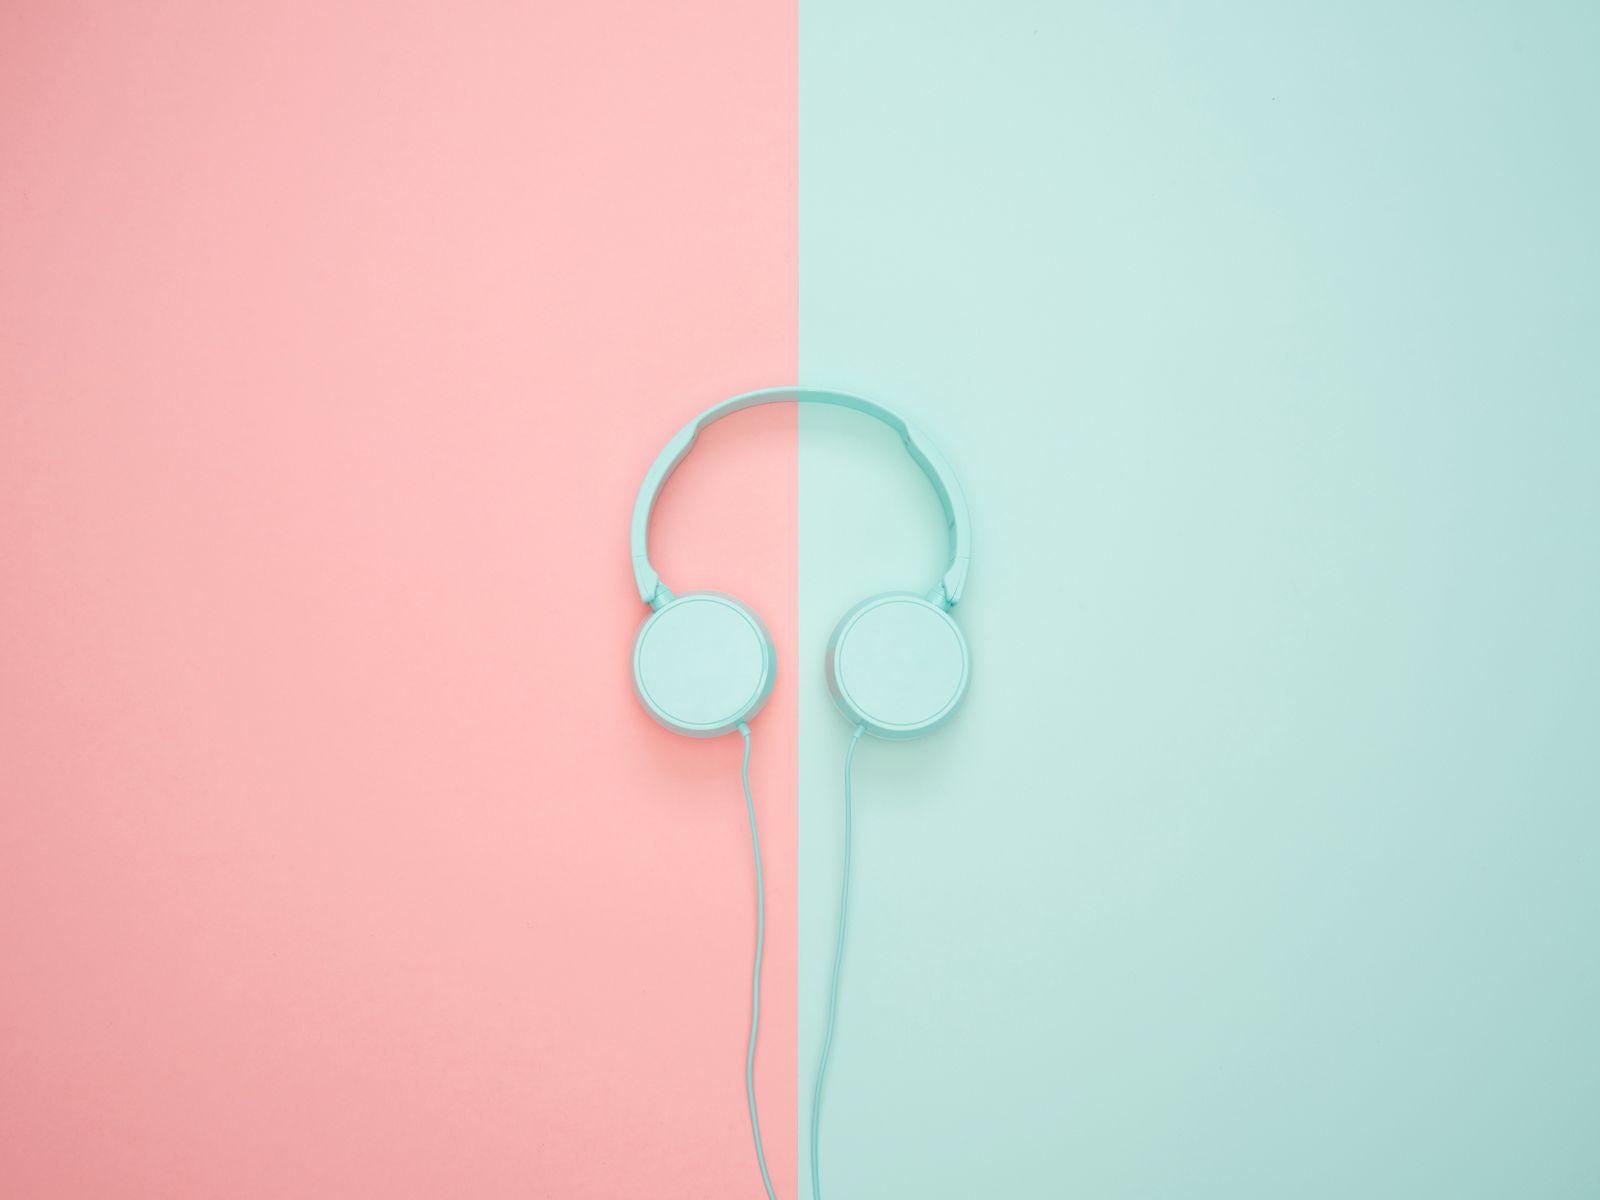 1600x1200 Wallpaper headphones, minimalism, pastel, pink